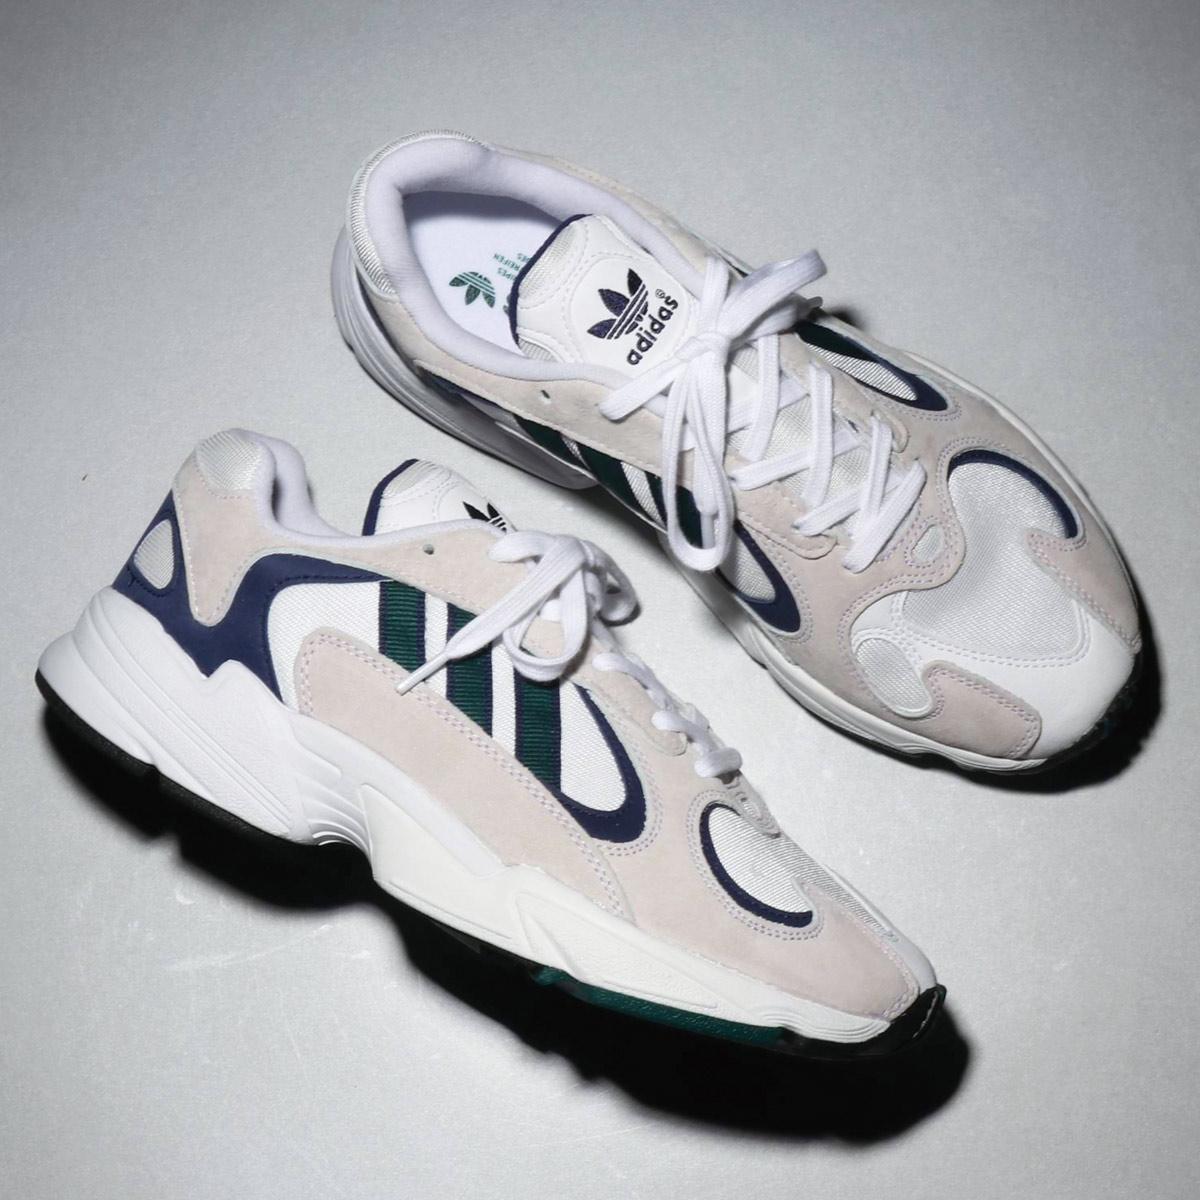 adidas Originals YUNG-1(アディダスオリジナルス ヤング-1)RUNNING WHITE/NOBLE GREEN/DARK BLUE【メンズ レディース スニーカー】18FW-S